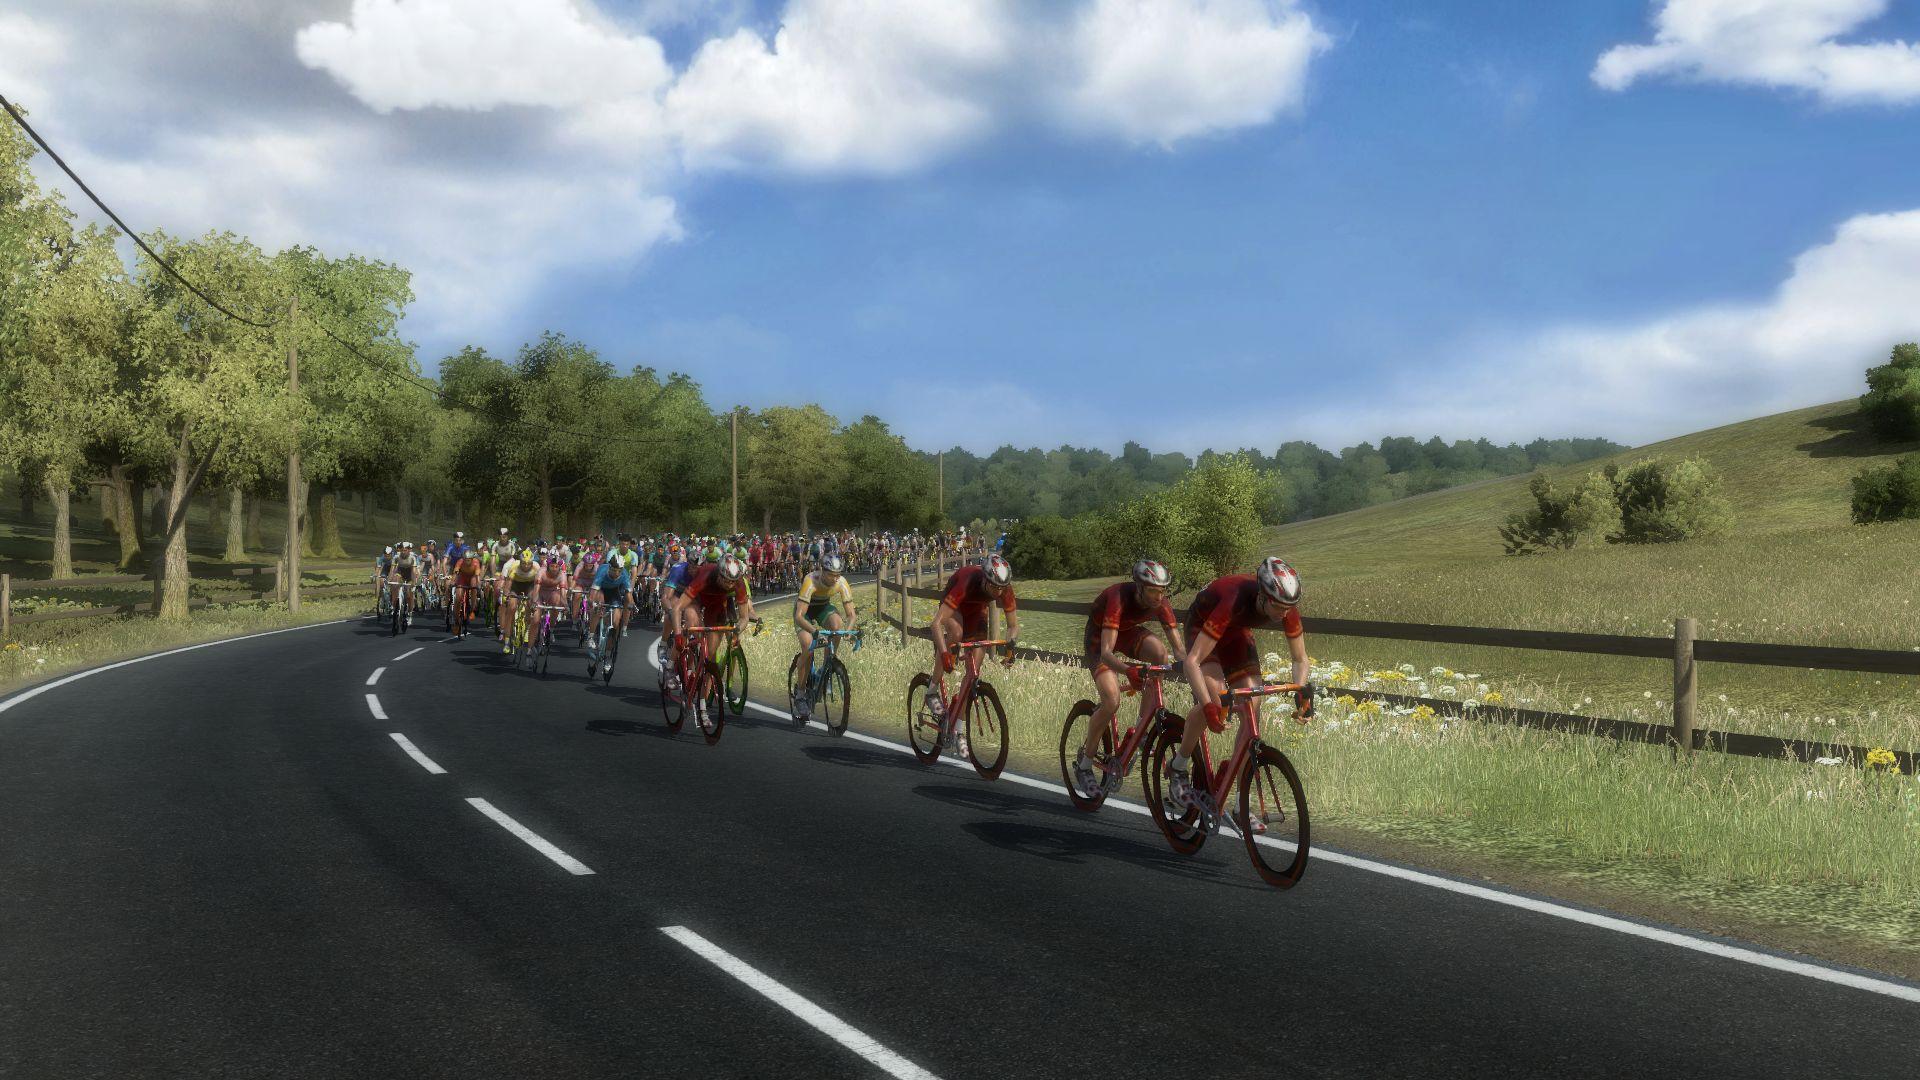 pcmdaily.com/images/mg/2019/Races/PT/Tirreno/mg19_ta_s07_09.jpg